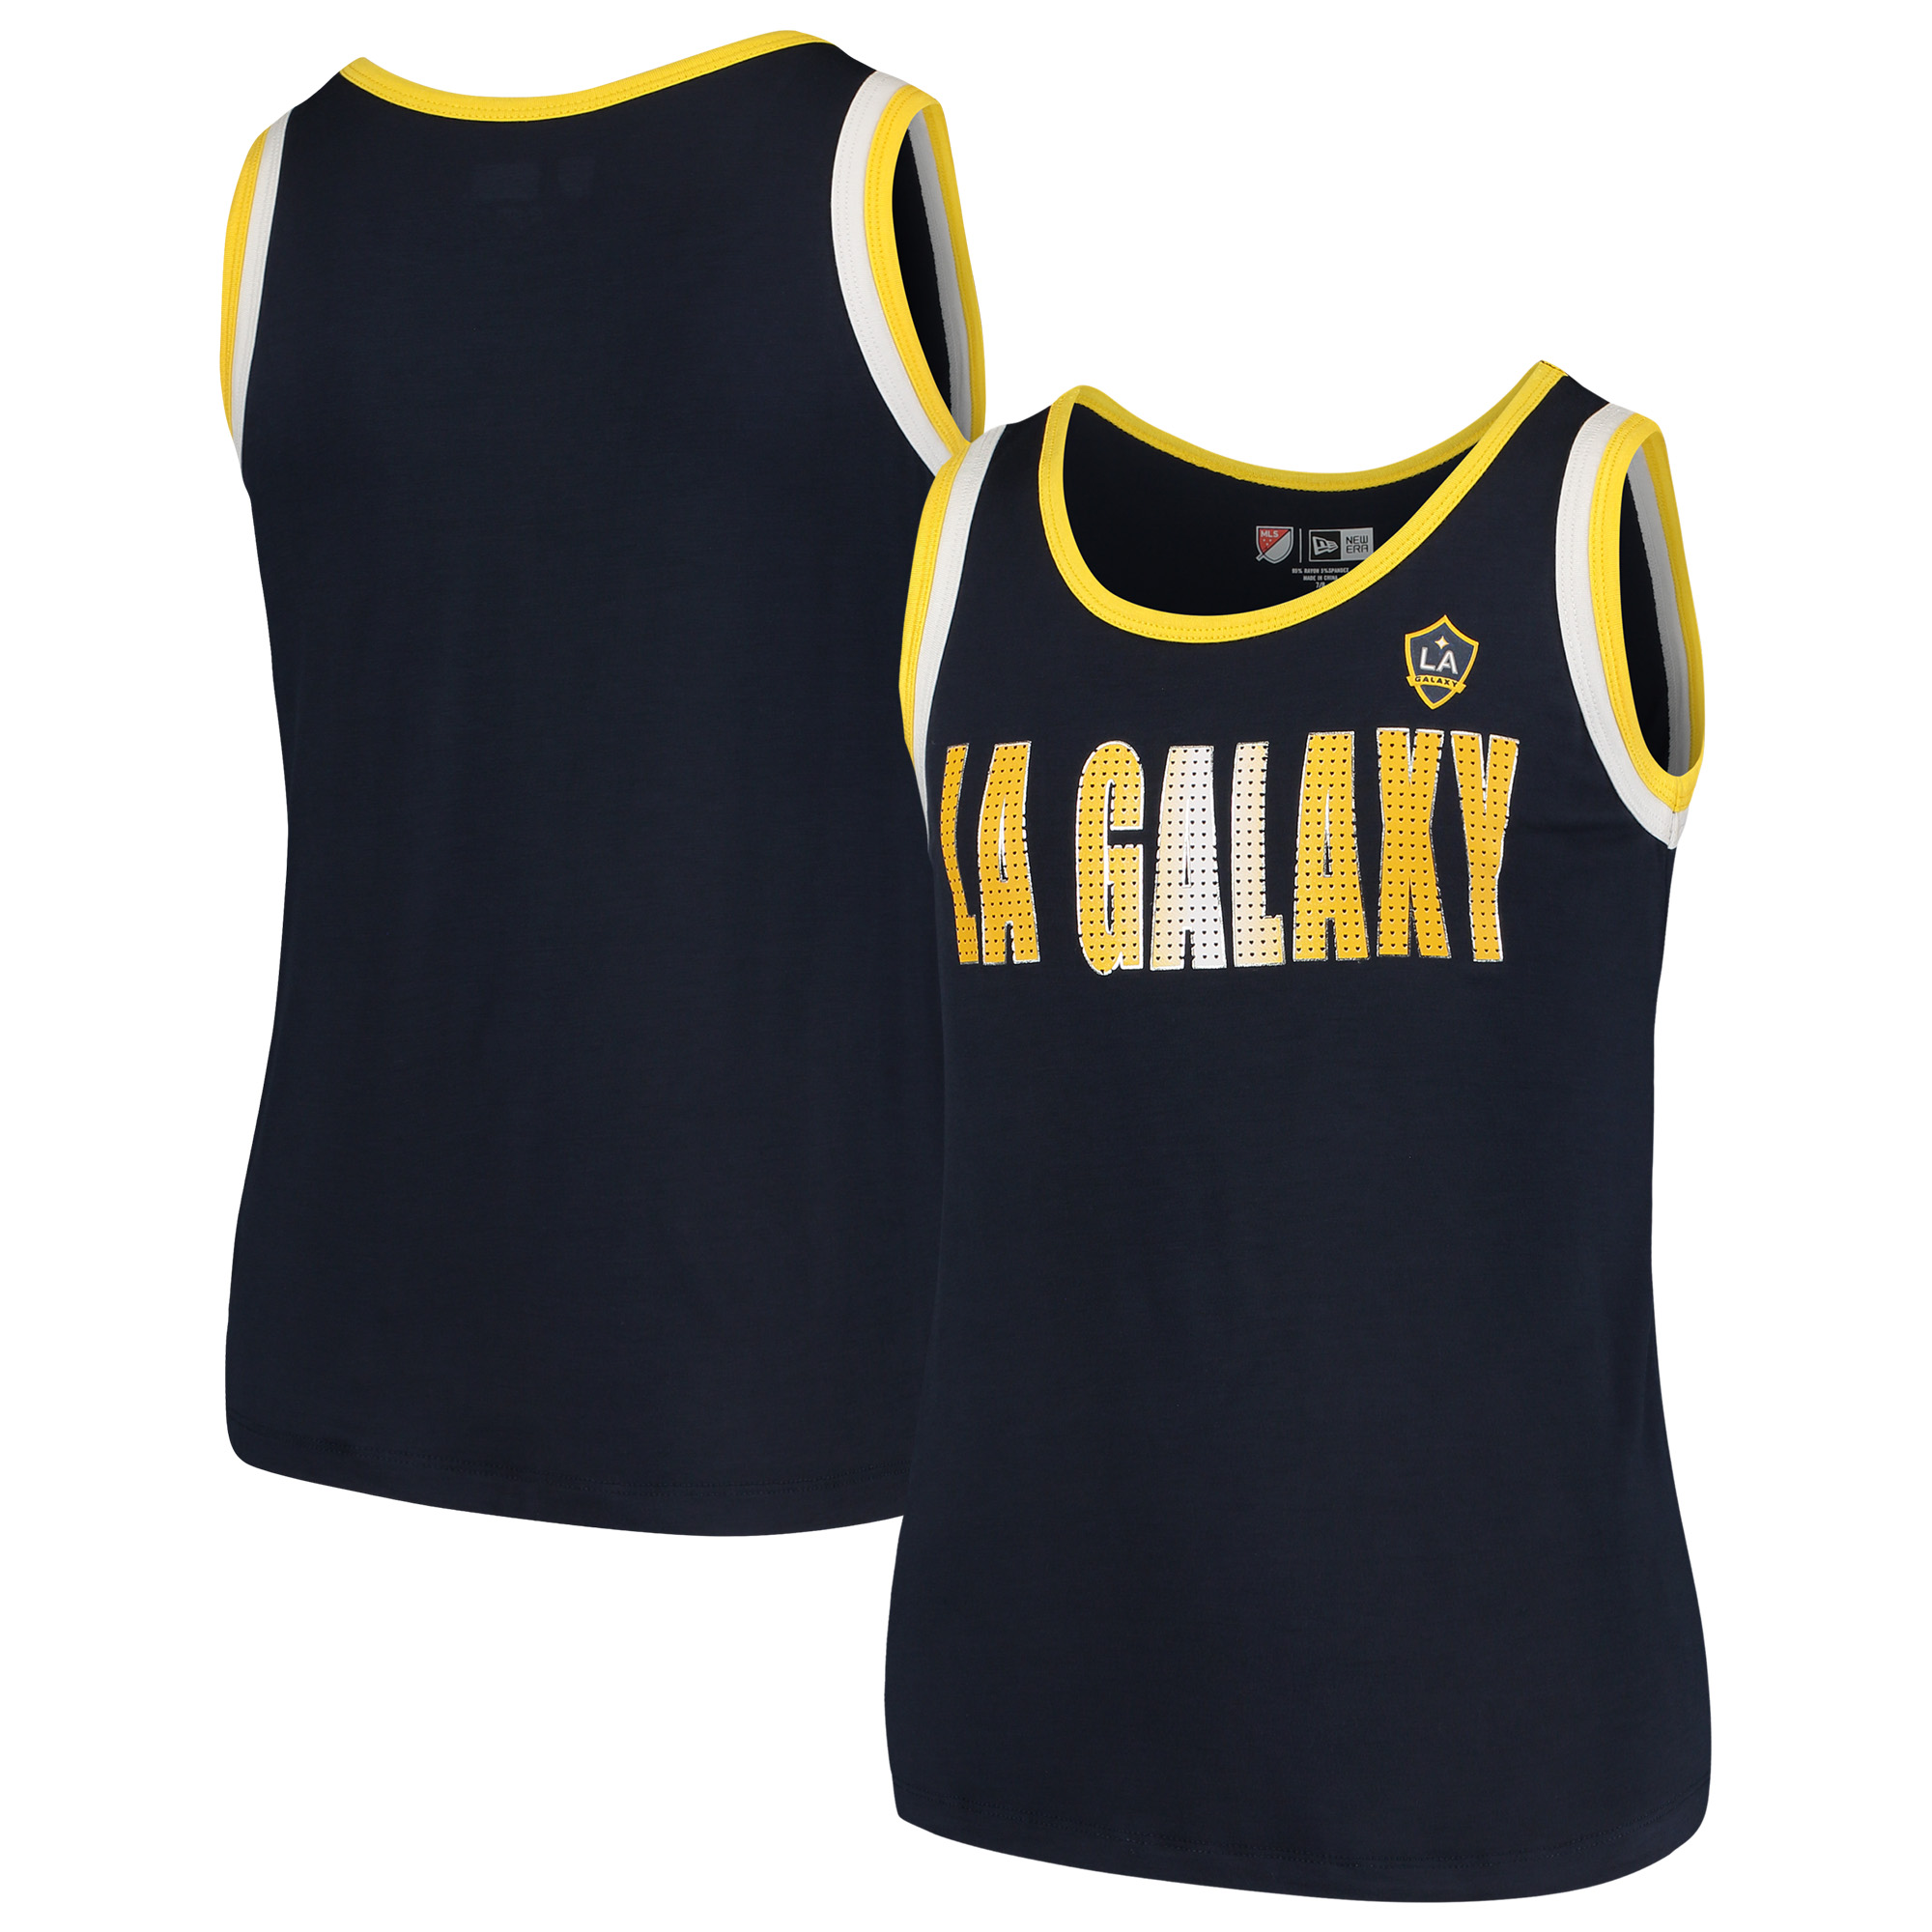 LA Galaxy 5th & Ocean by New Era Girls Youth Team Color Tank Top - Navy